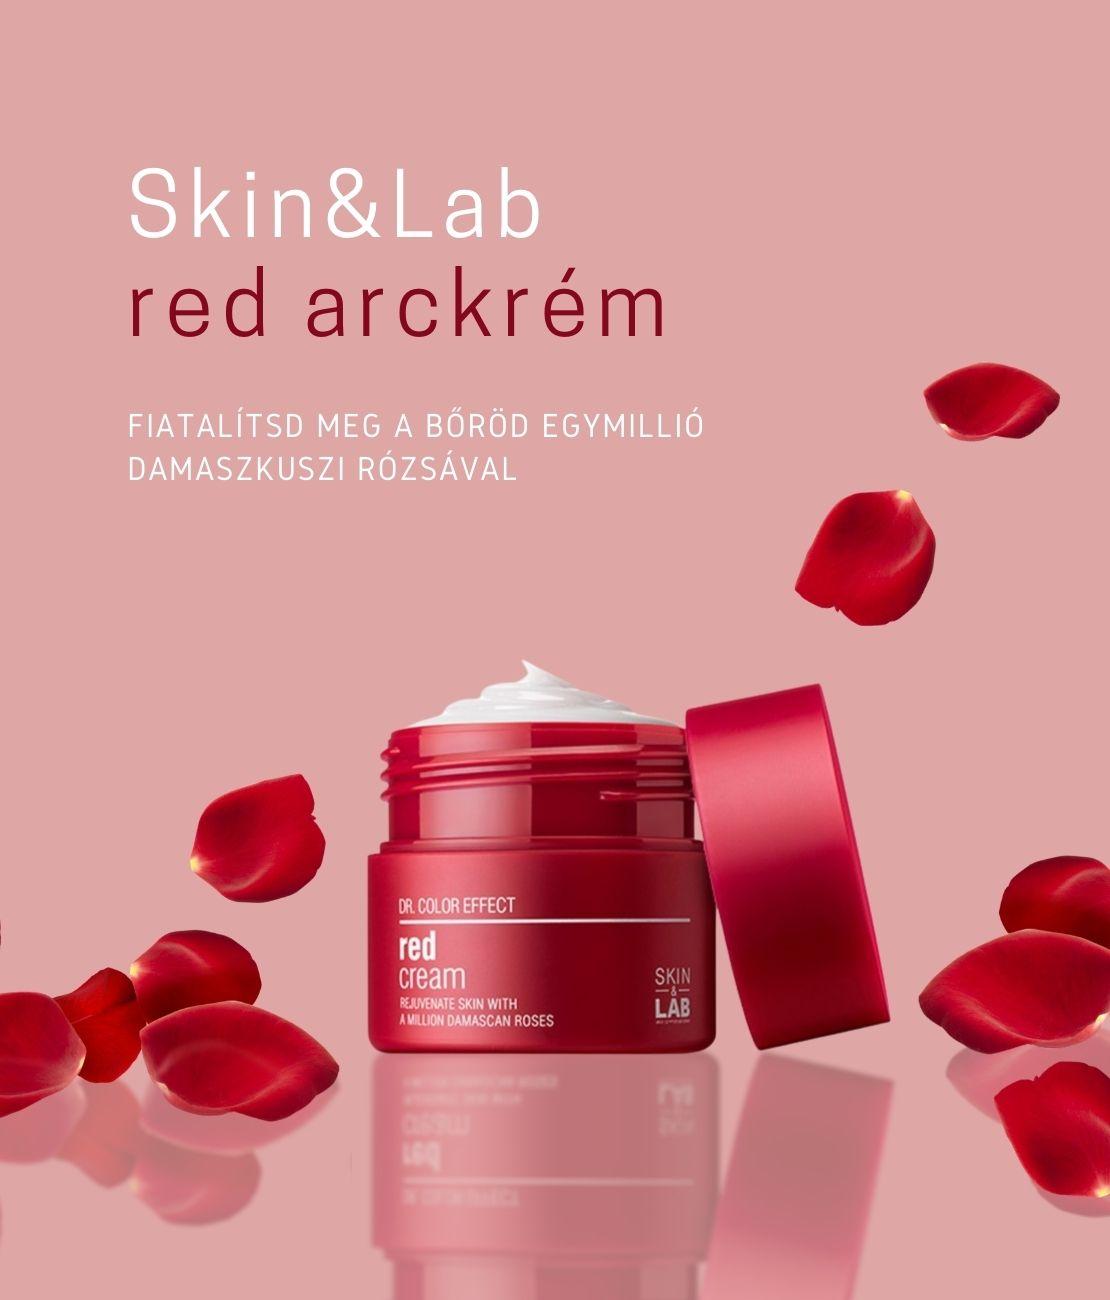 skin-n-lab-skin&lab-red-cream-arckrem